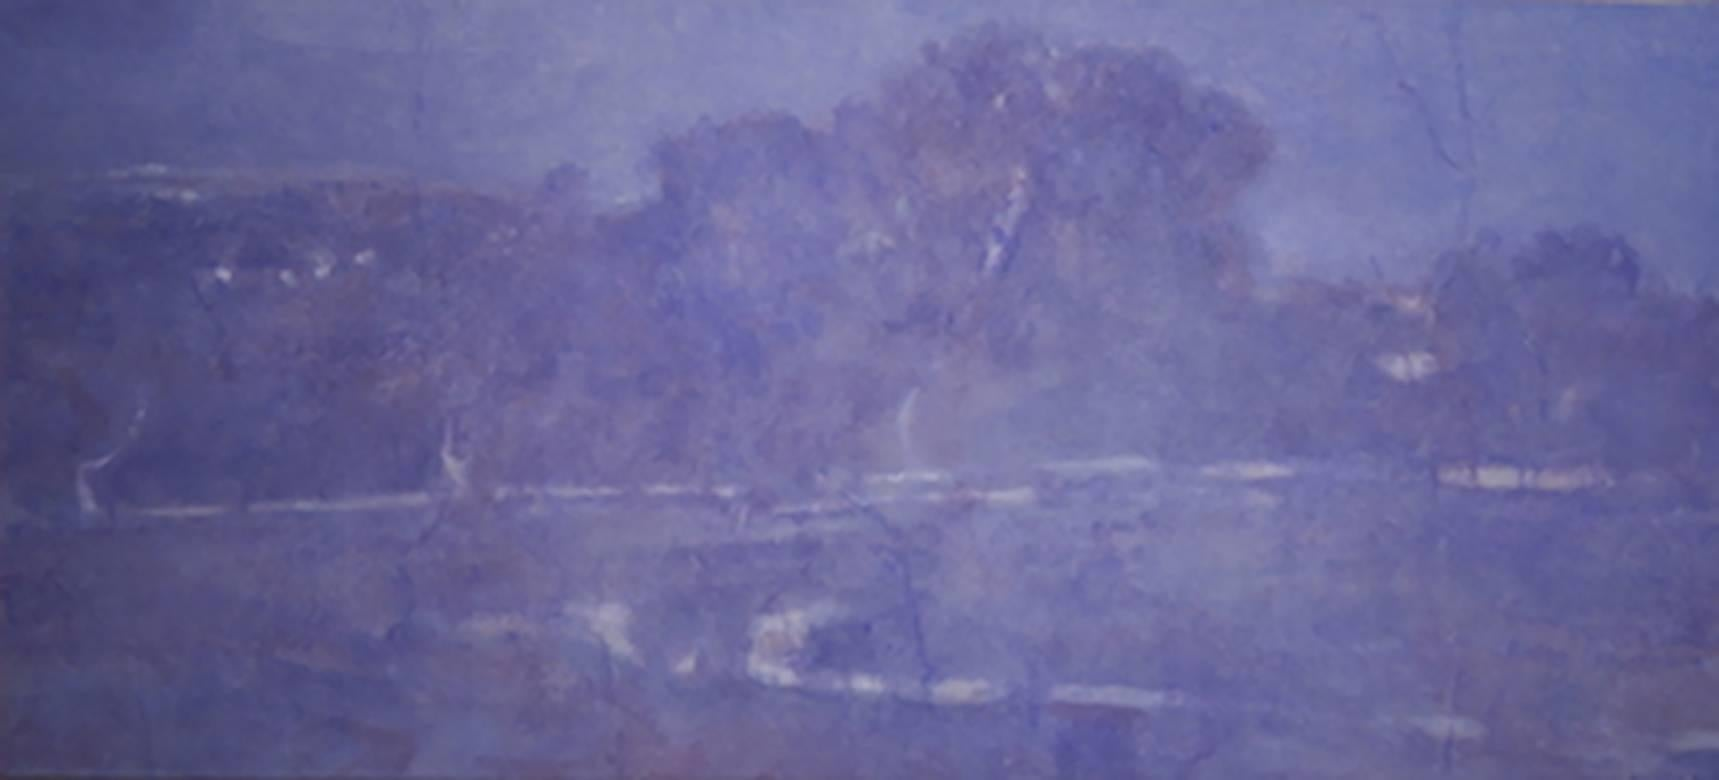 Road to Olana (Horizontal Monochromatic Purple Landscape Painting on Canvas)